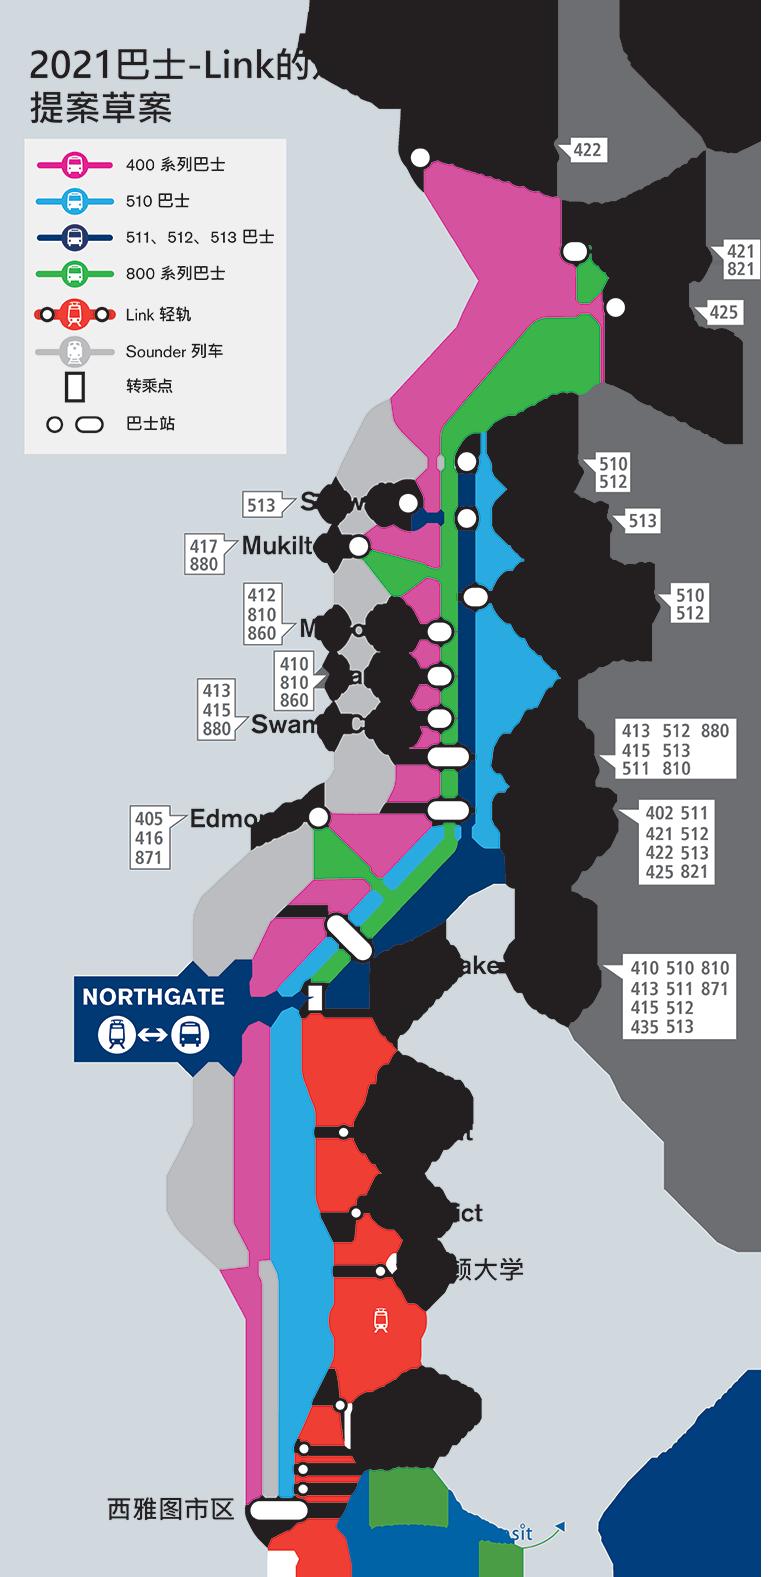 一张Snohomish和 King County的地图,显示了起草好的Sound Transit 和Community Transit的服务提案。线路都将以Northgate Station为终点或继续前往西雅图市区。